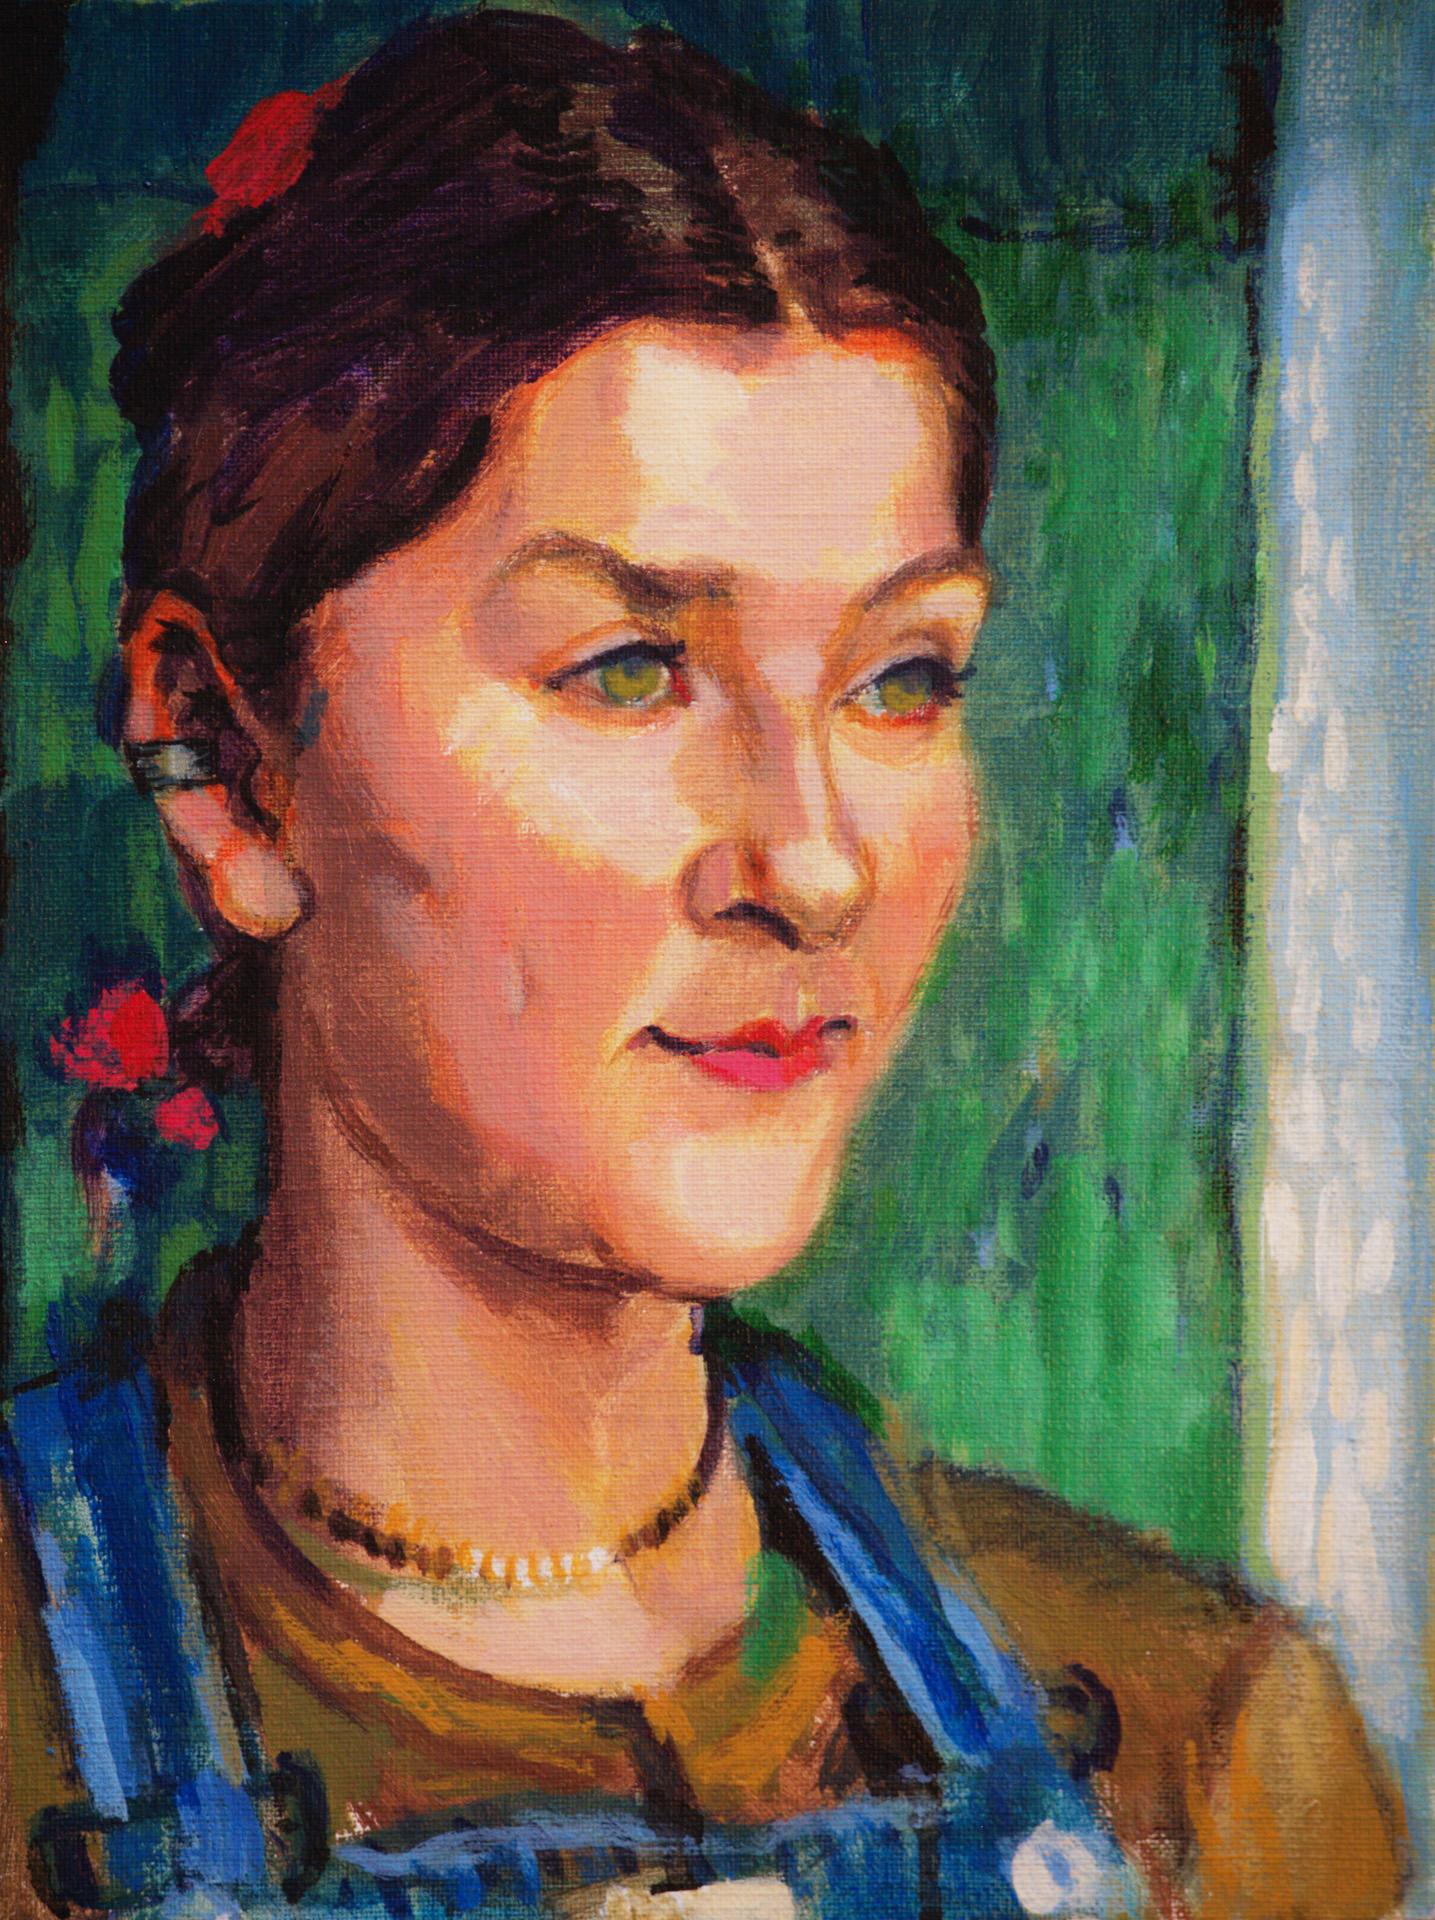 1997_portrait_30x40cm_Ivana.jpg